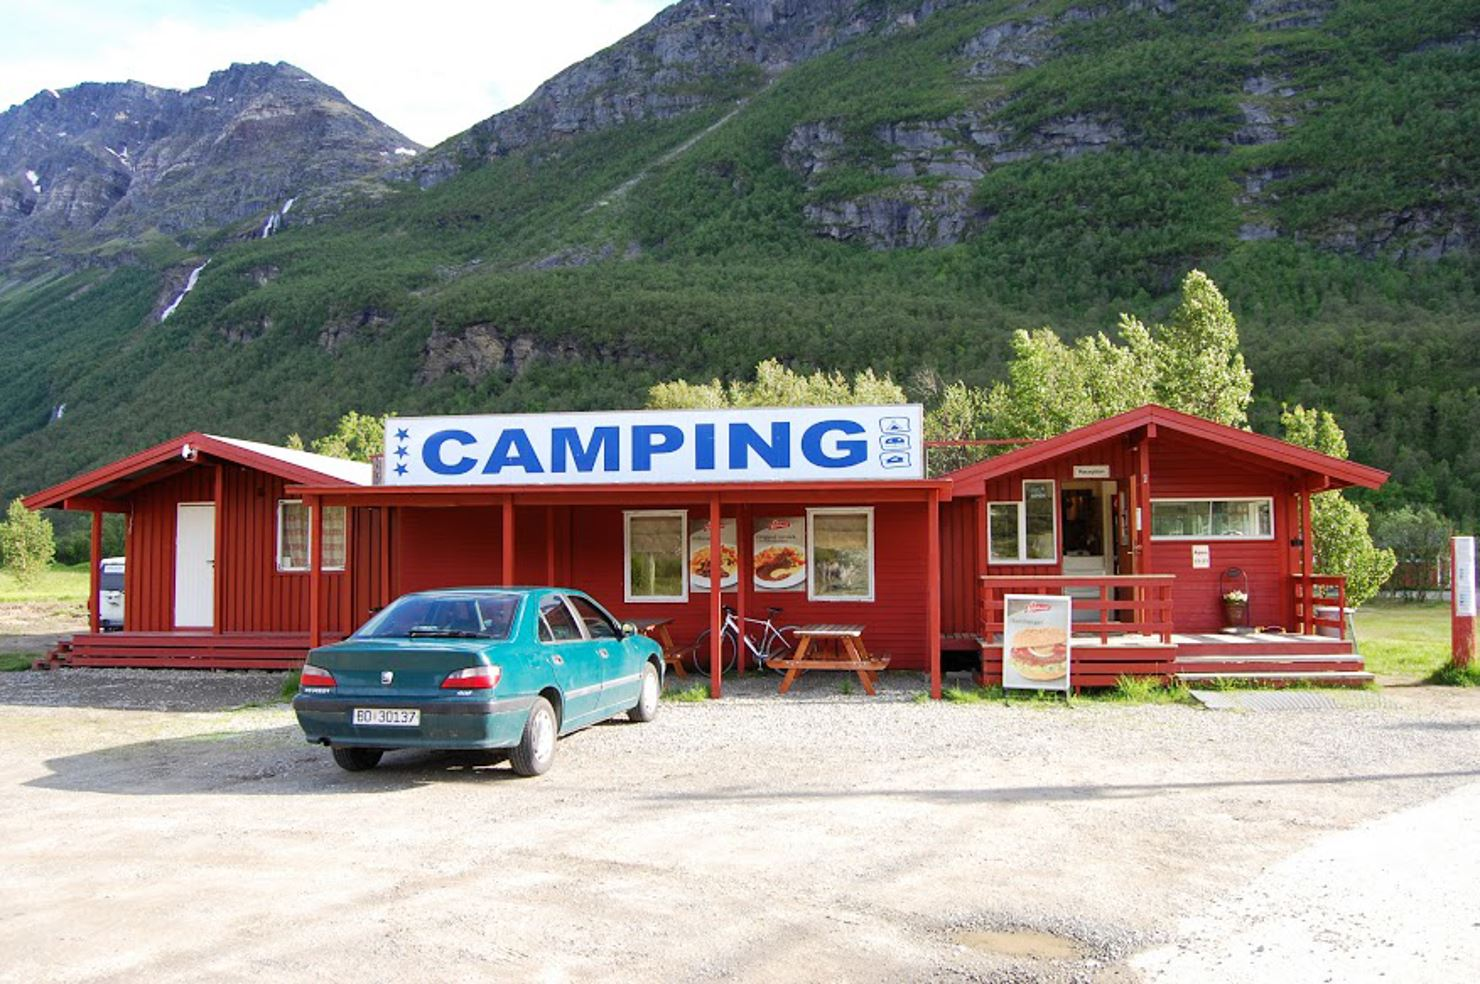 High North Birtavarre Camping,  © High North Birtavarre Camping, High North Birtavarre Camping